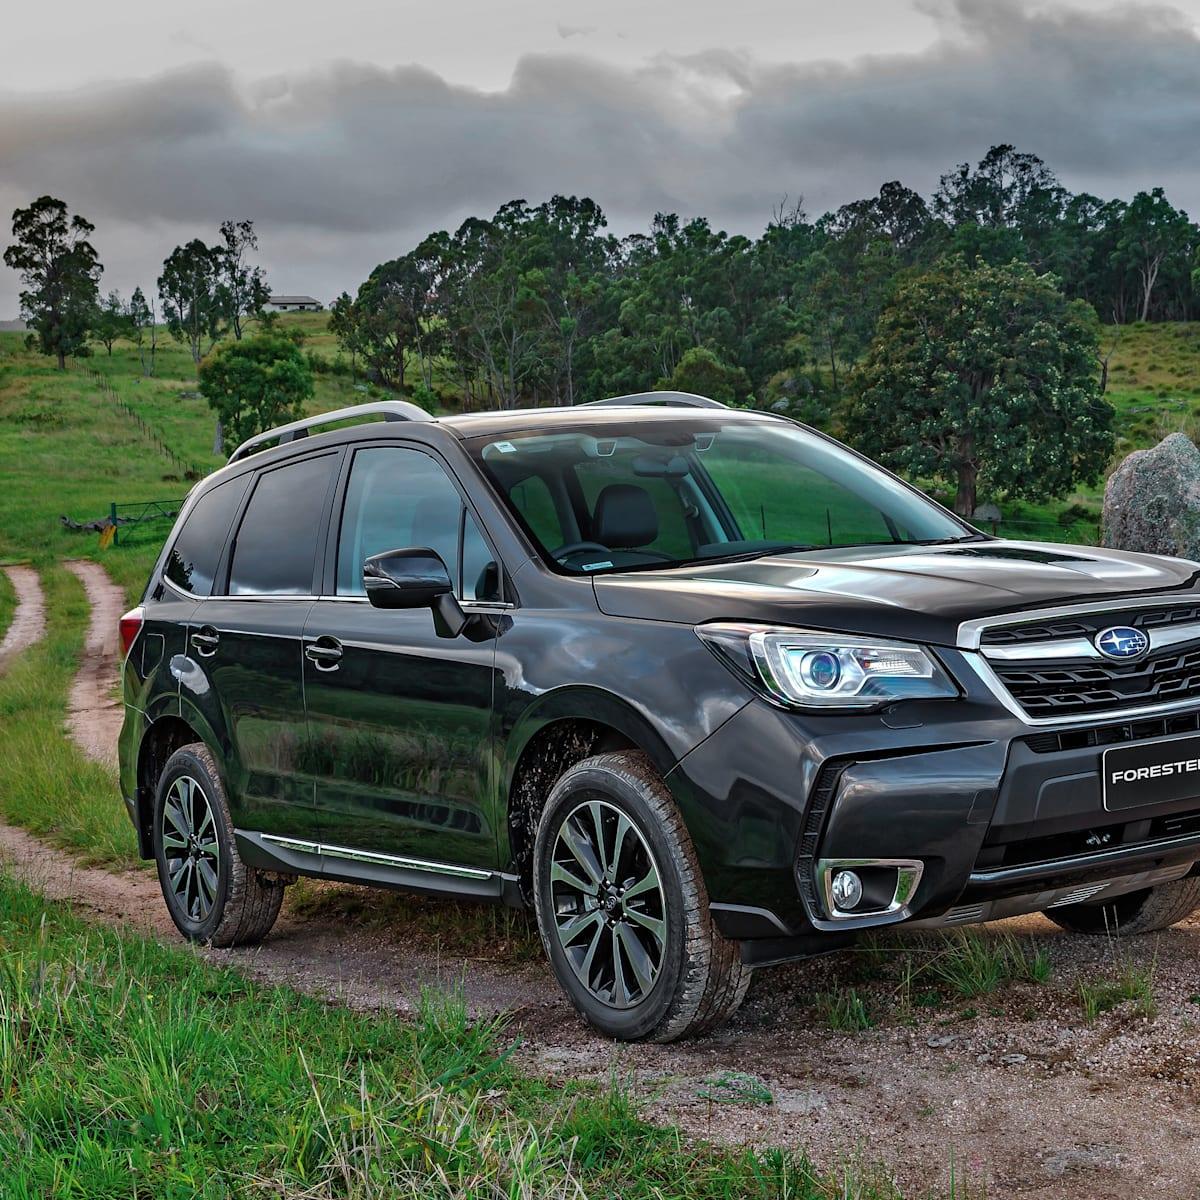 Subaru Forester Xt 2018 Specs Best Auto Cars Reviews